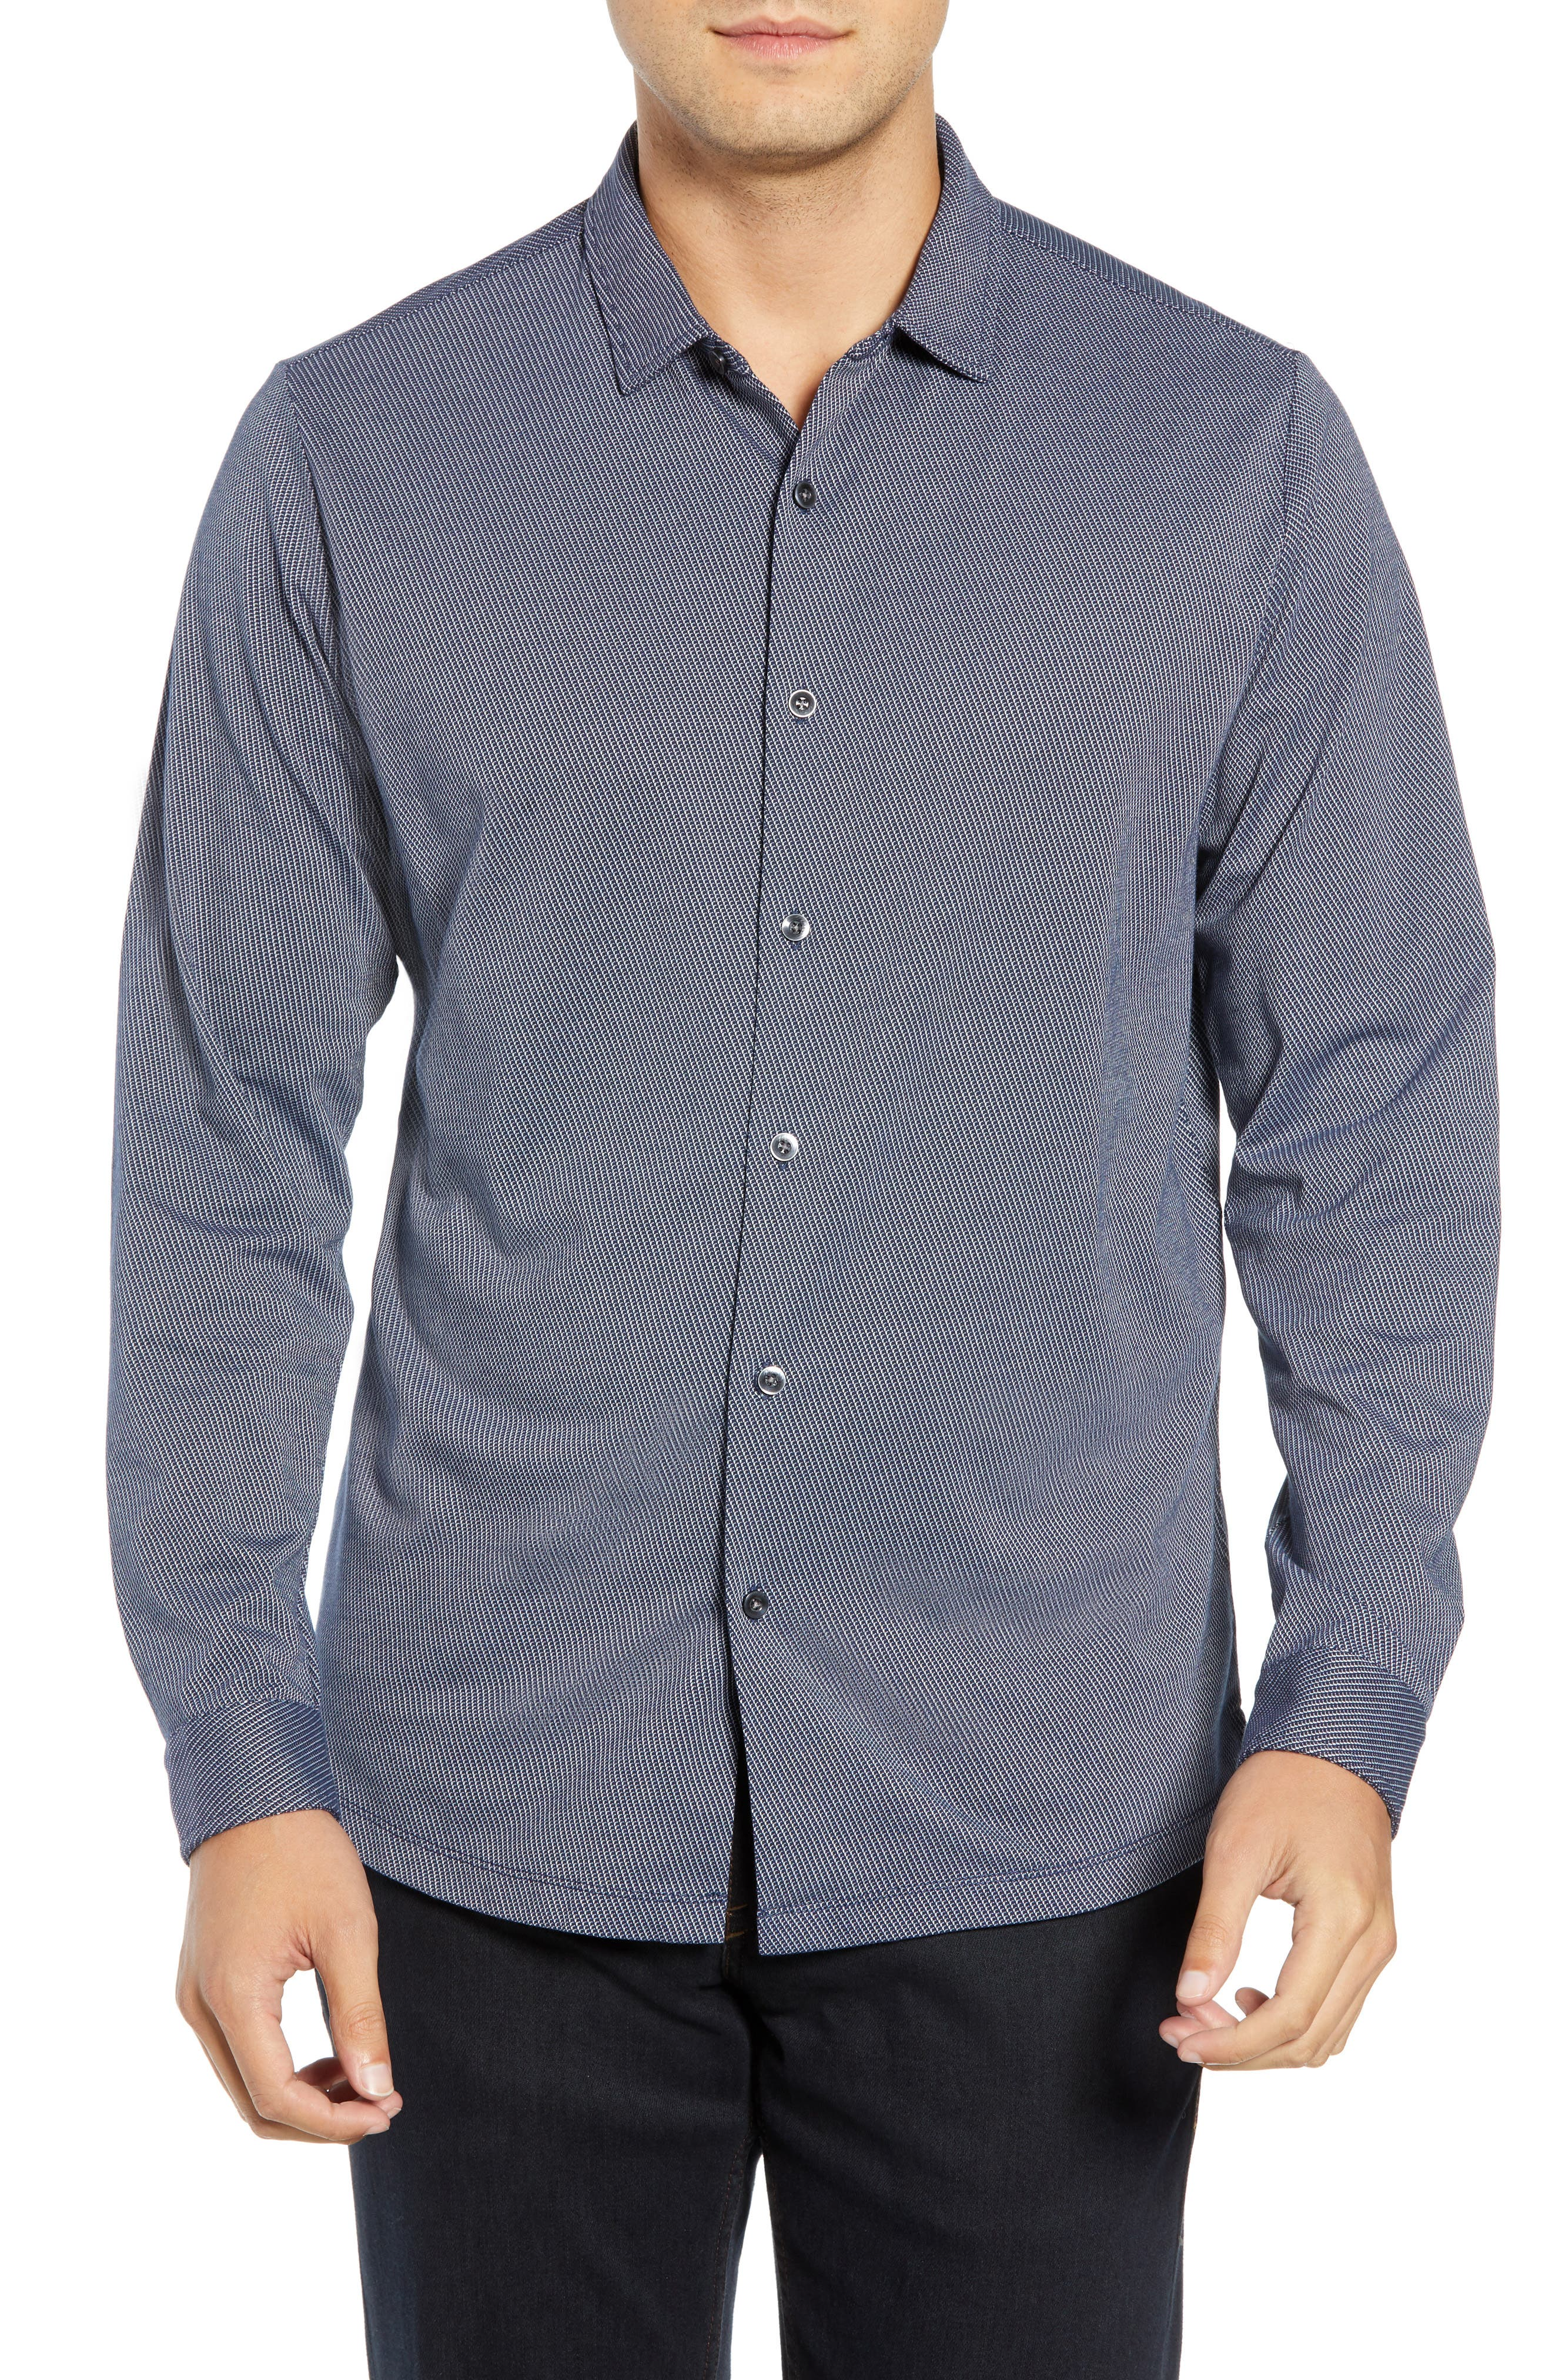 Colby Regular Fit Knit Sport Shirt,                             Main thumbnail 1, color,                             NAVY